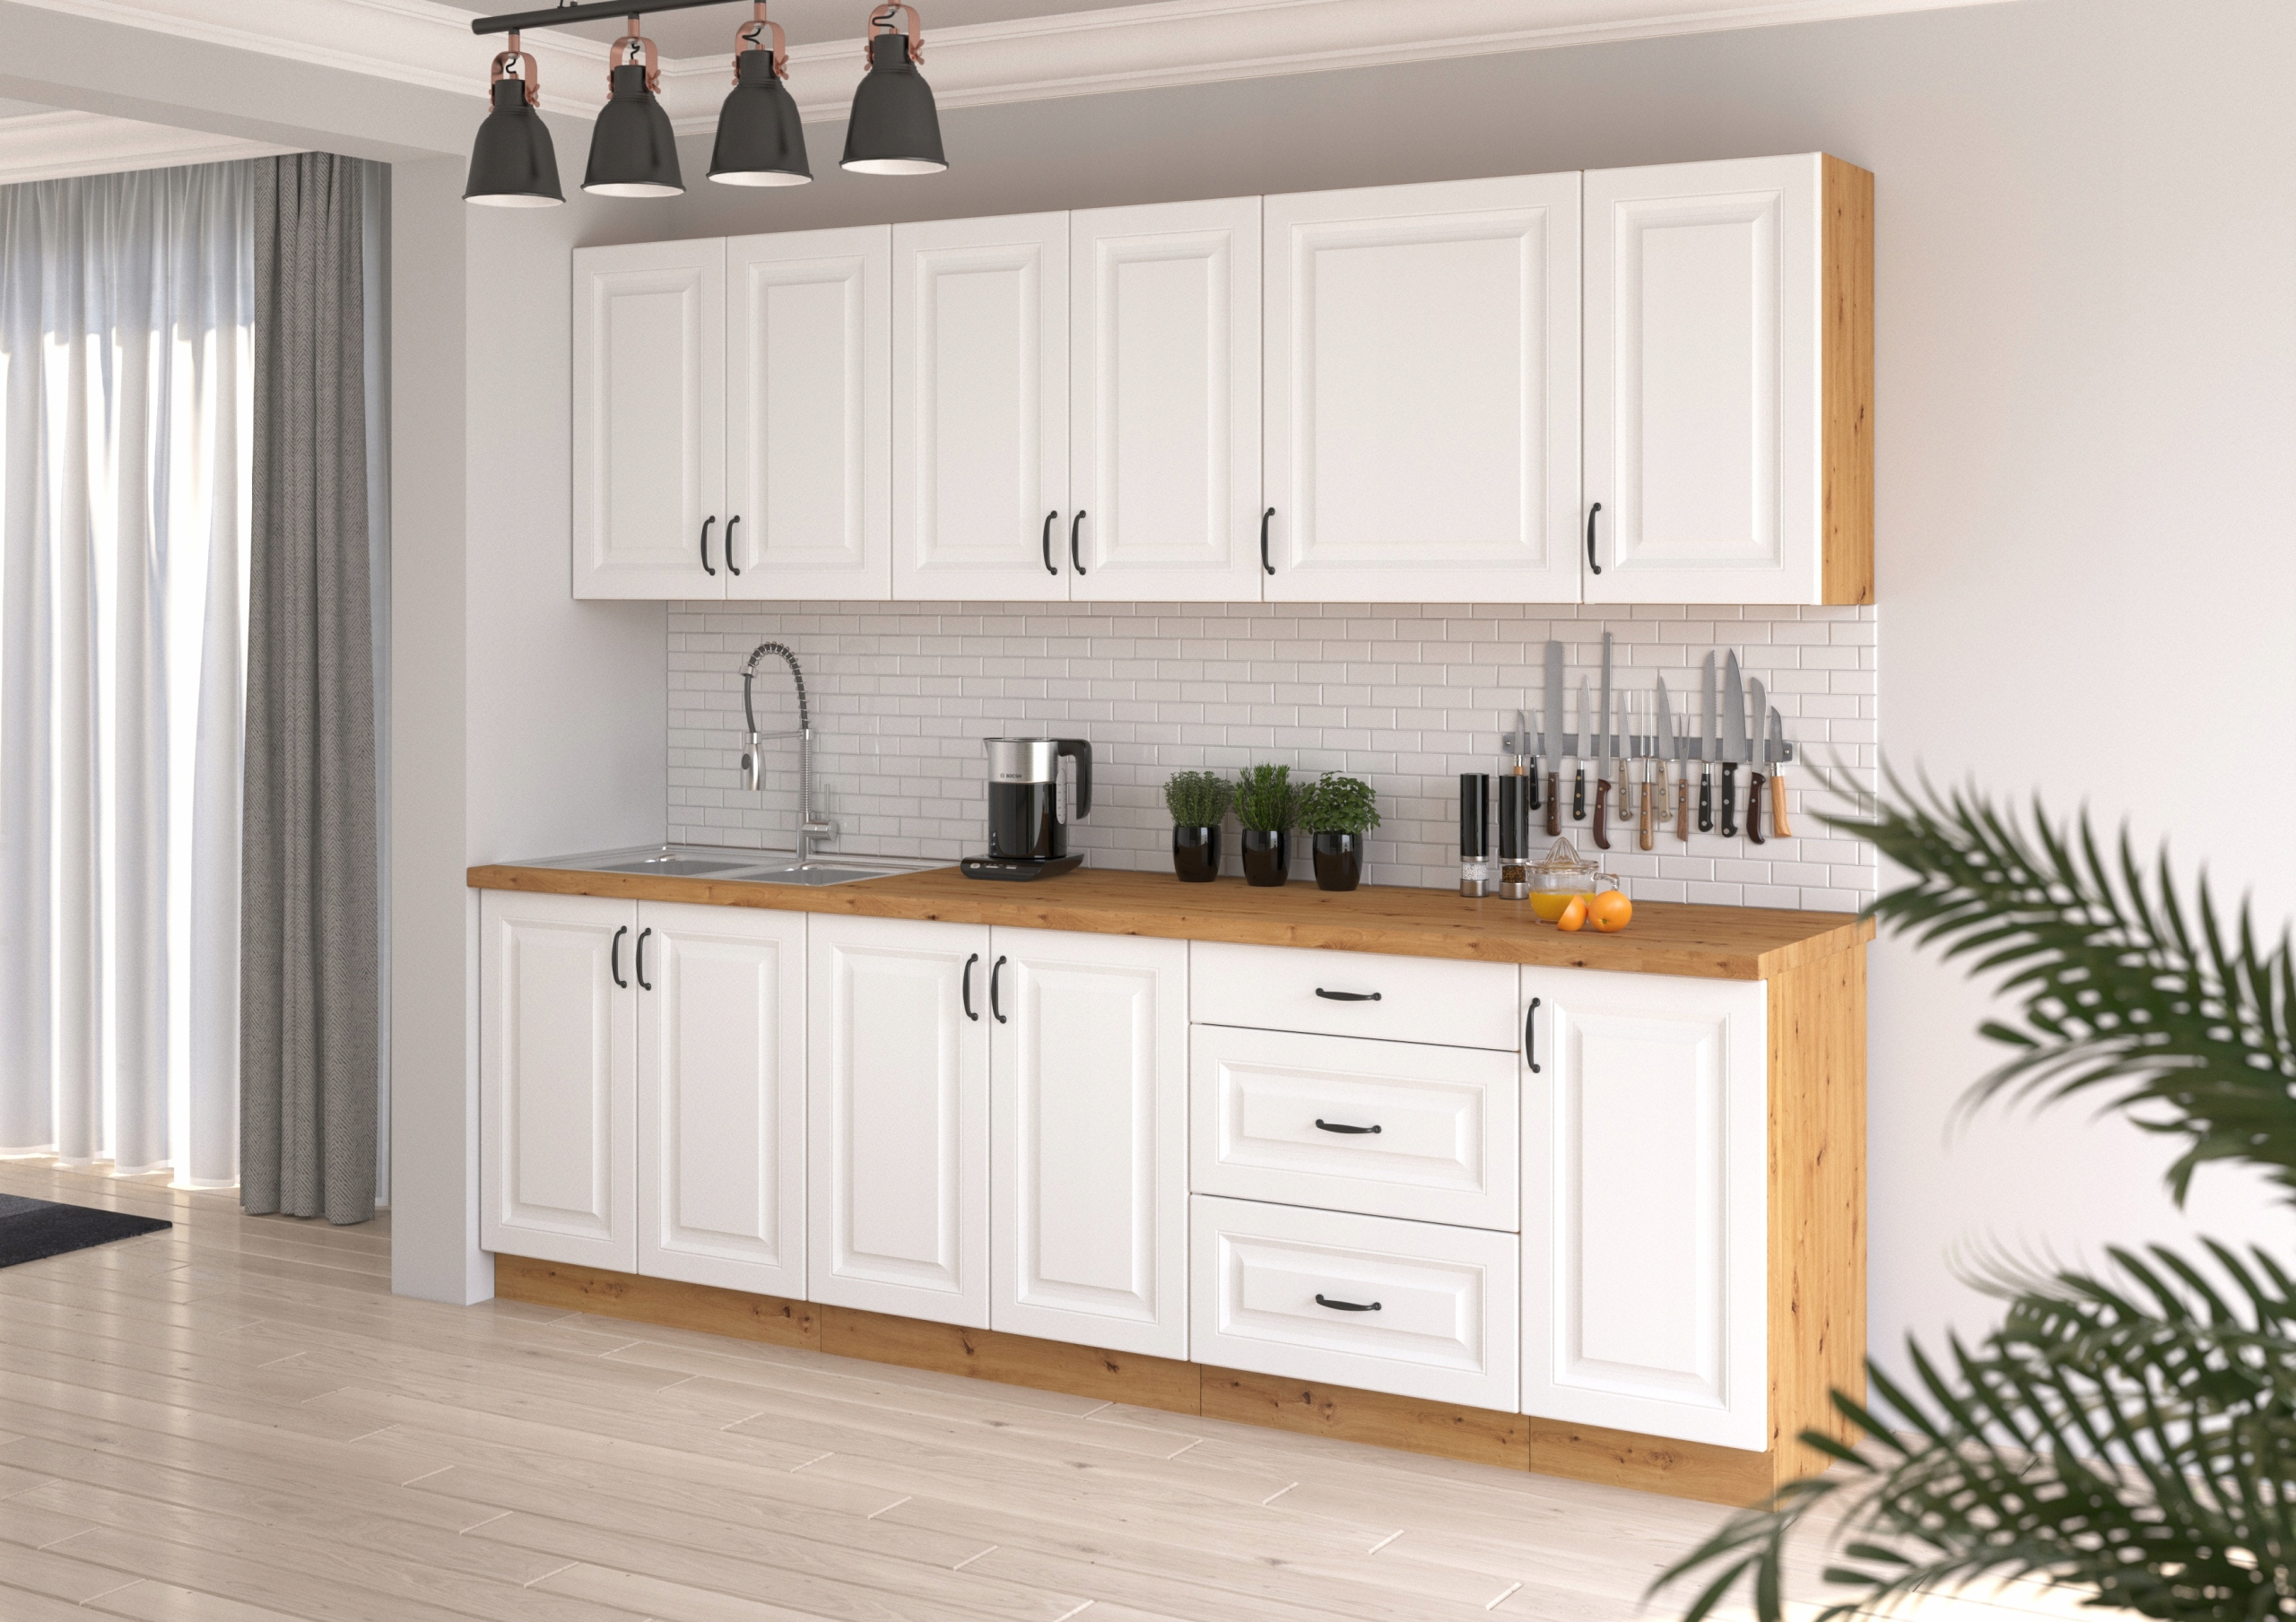 zostava kuchynského nábytku RETRO 260cm BIELY MAT